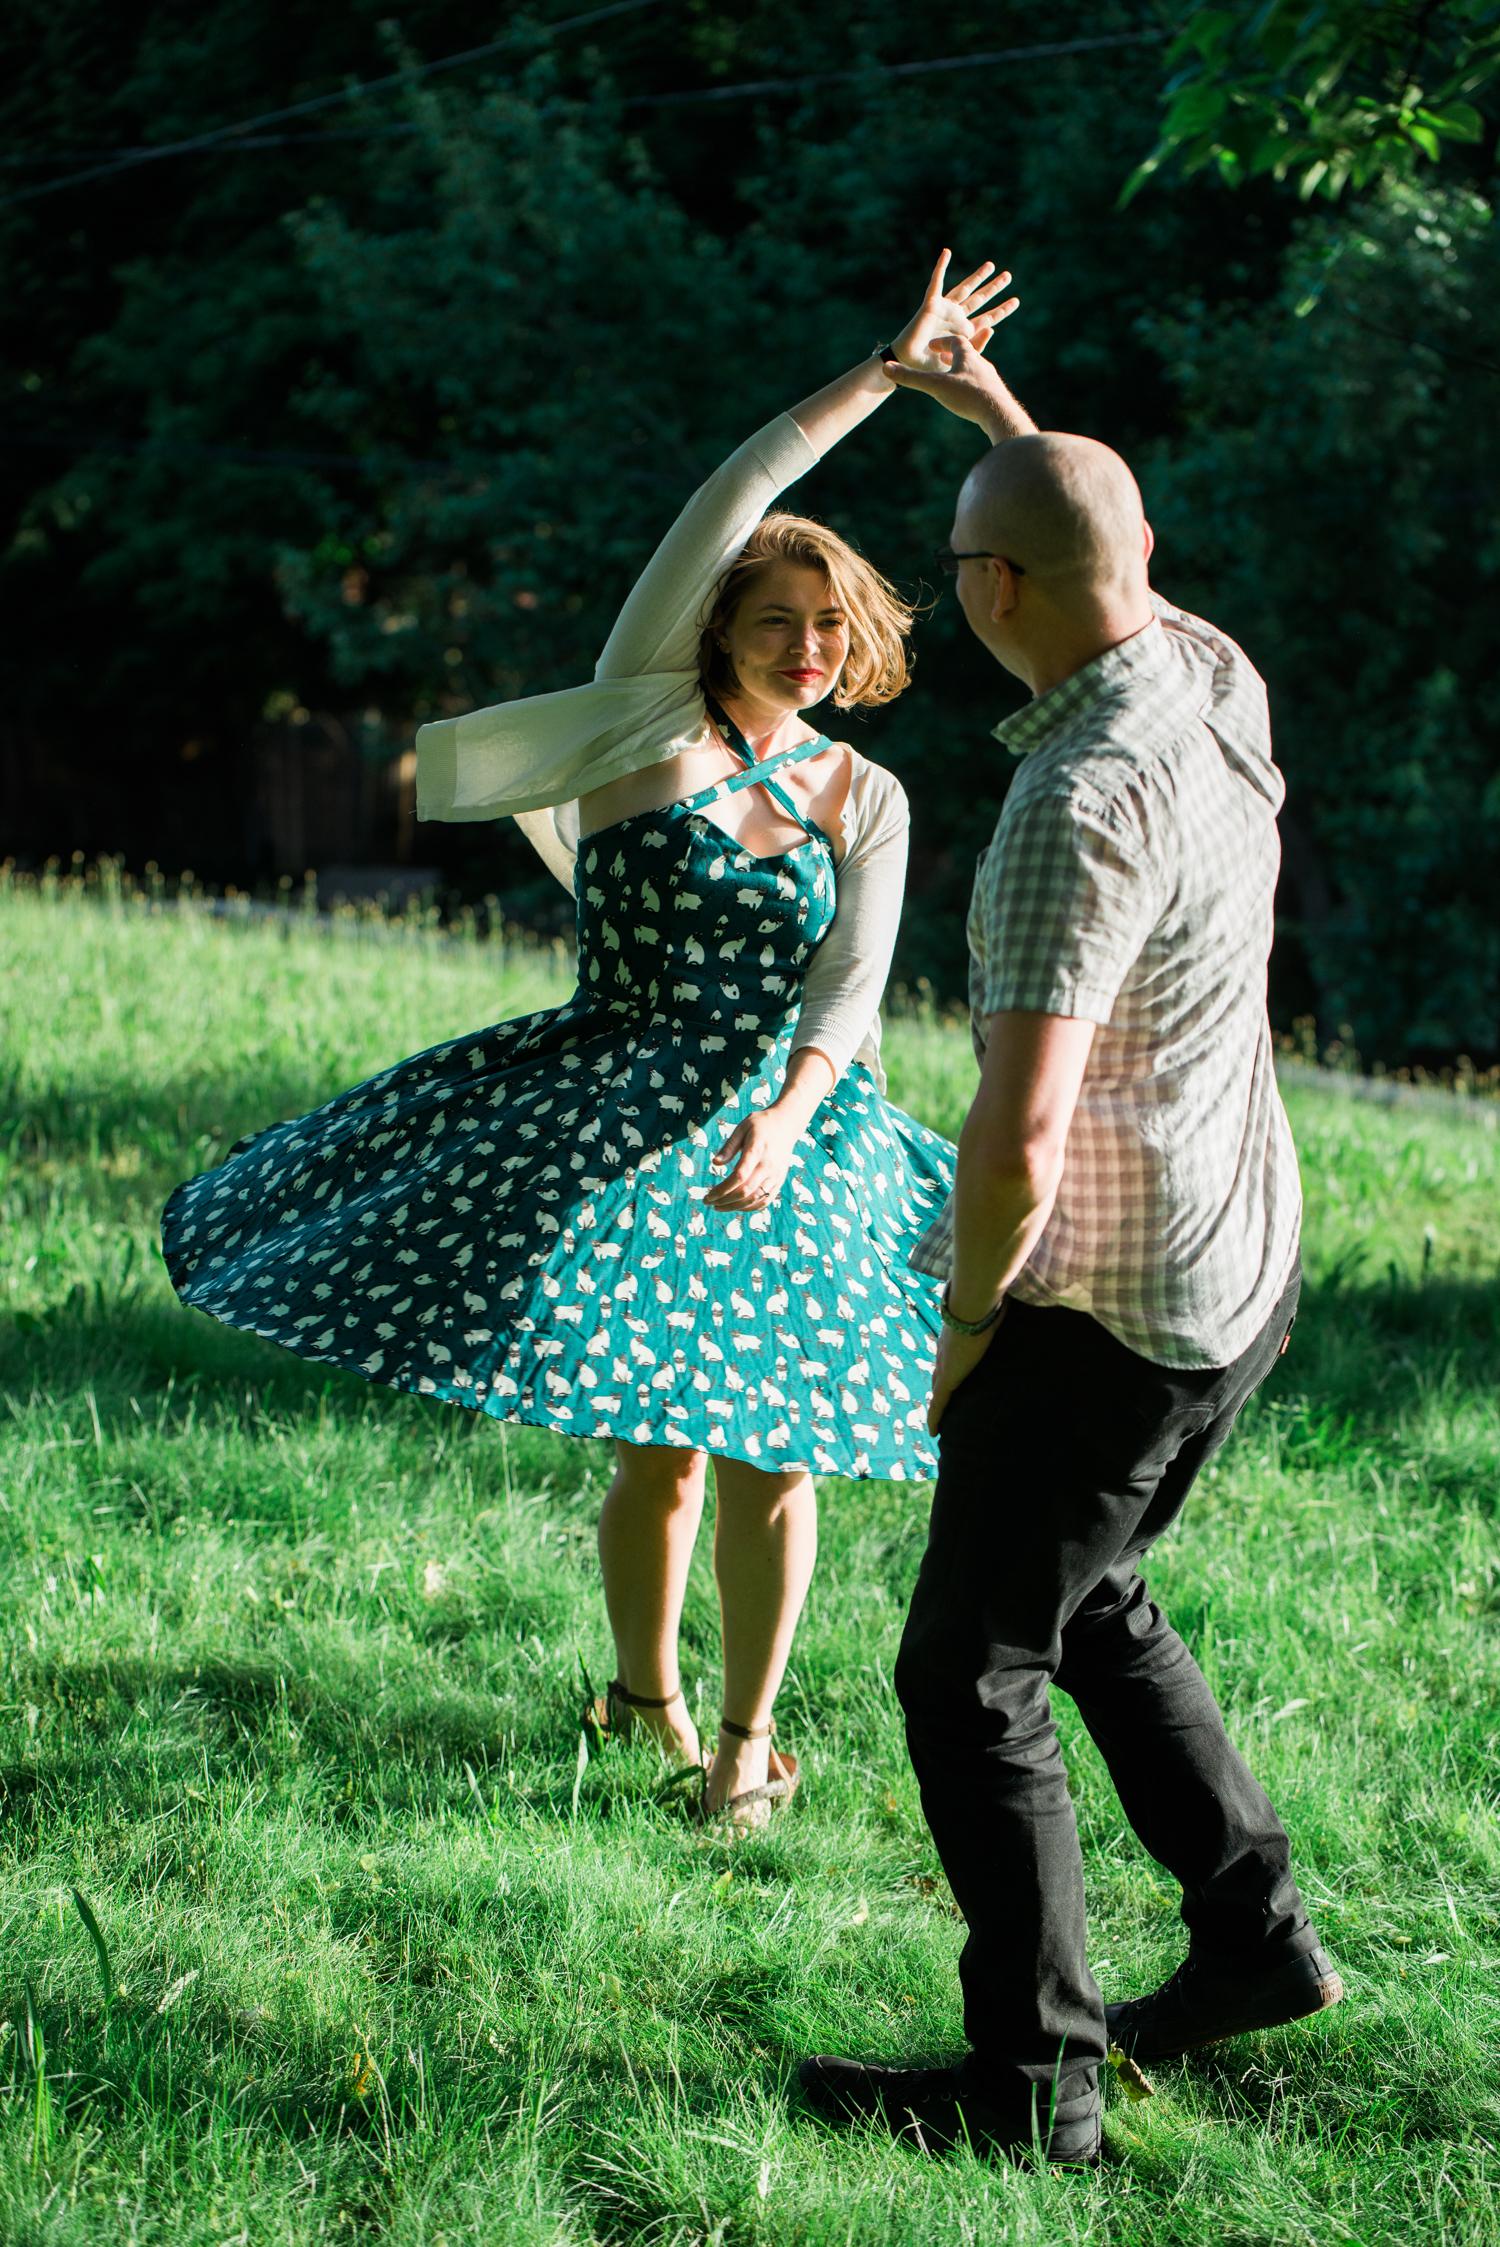 Ephemera Photography - Park Engagement photoshoot of couple dancing in grass